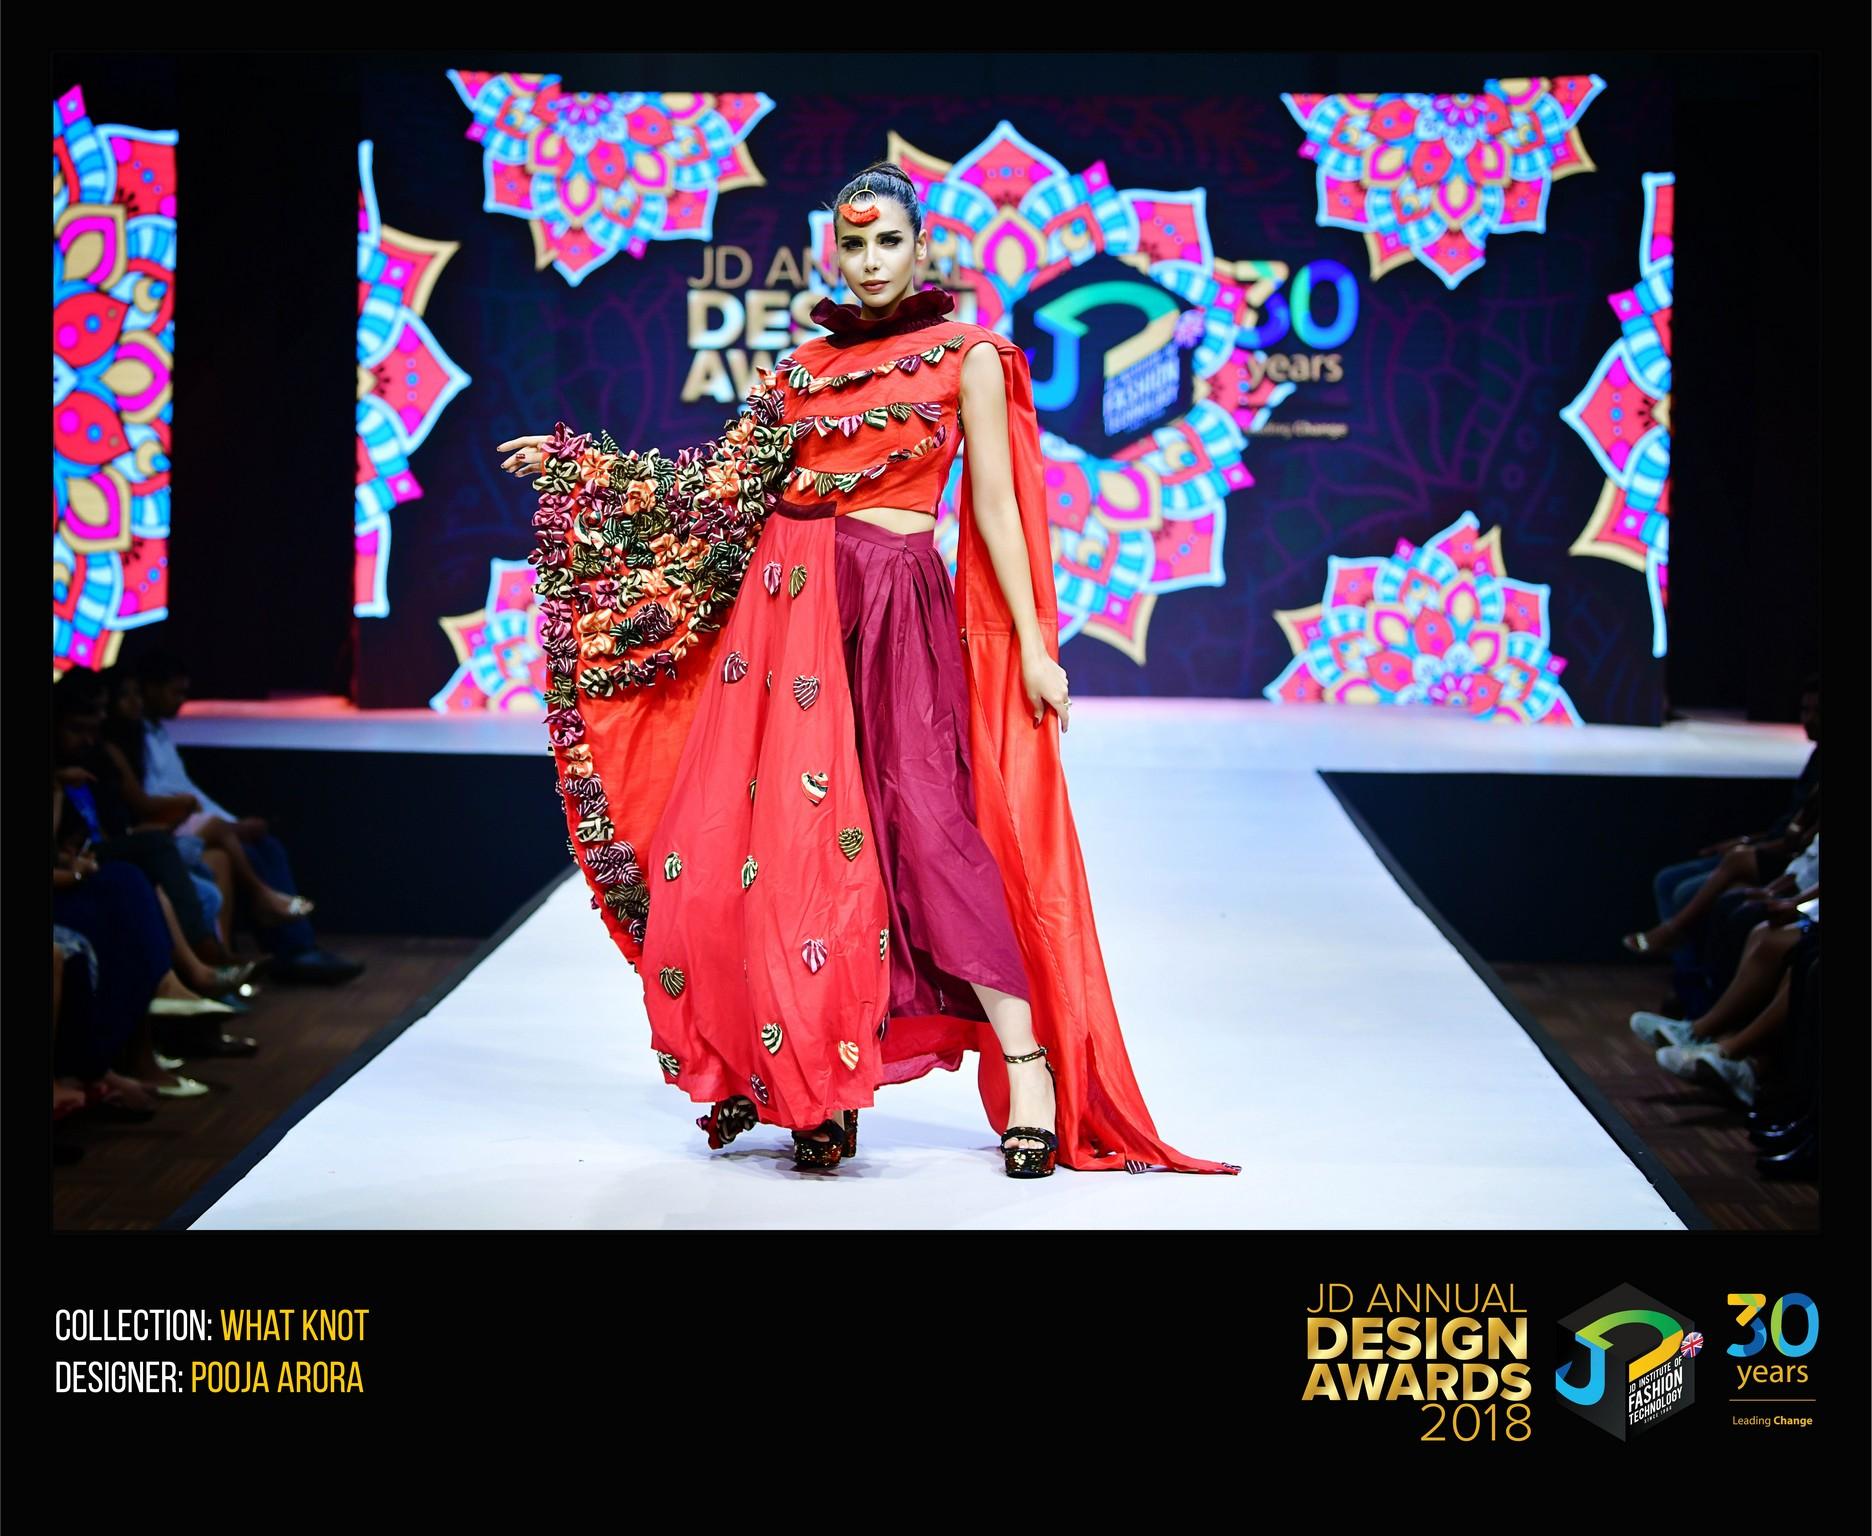 What Knot - Change - JDAnnual Design Awards 2018 | Designer: Naailah, Reema, Shreya | Photography : Jerin Nath (@jerin_nath) what knot - change - jdannual design awards 2018 - WHAT KNOT 4 - What Knot – Change – JDAnnual Design Awards 2018